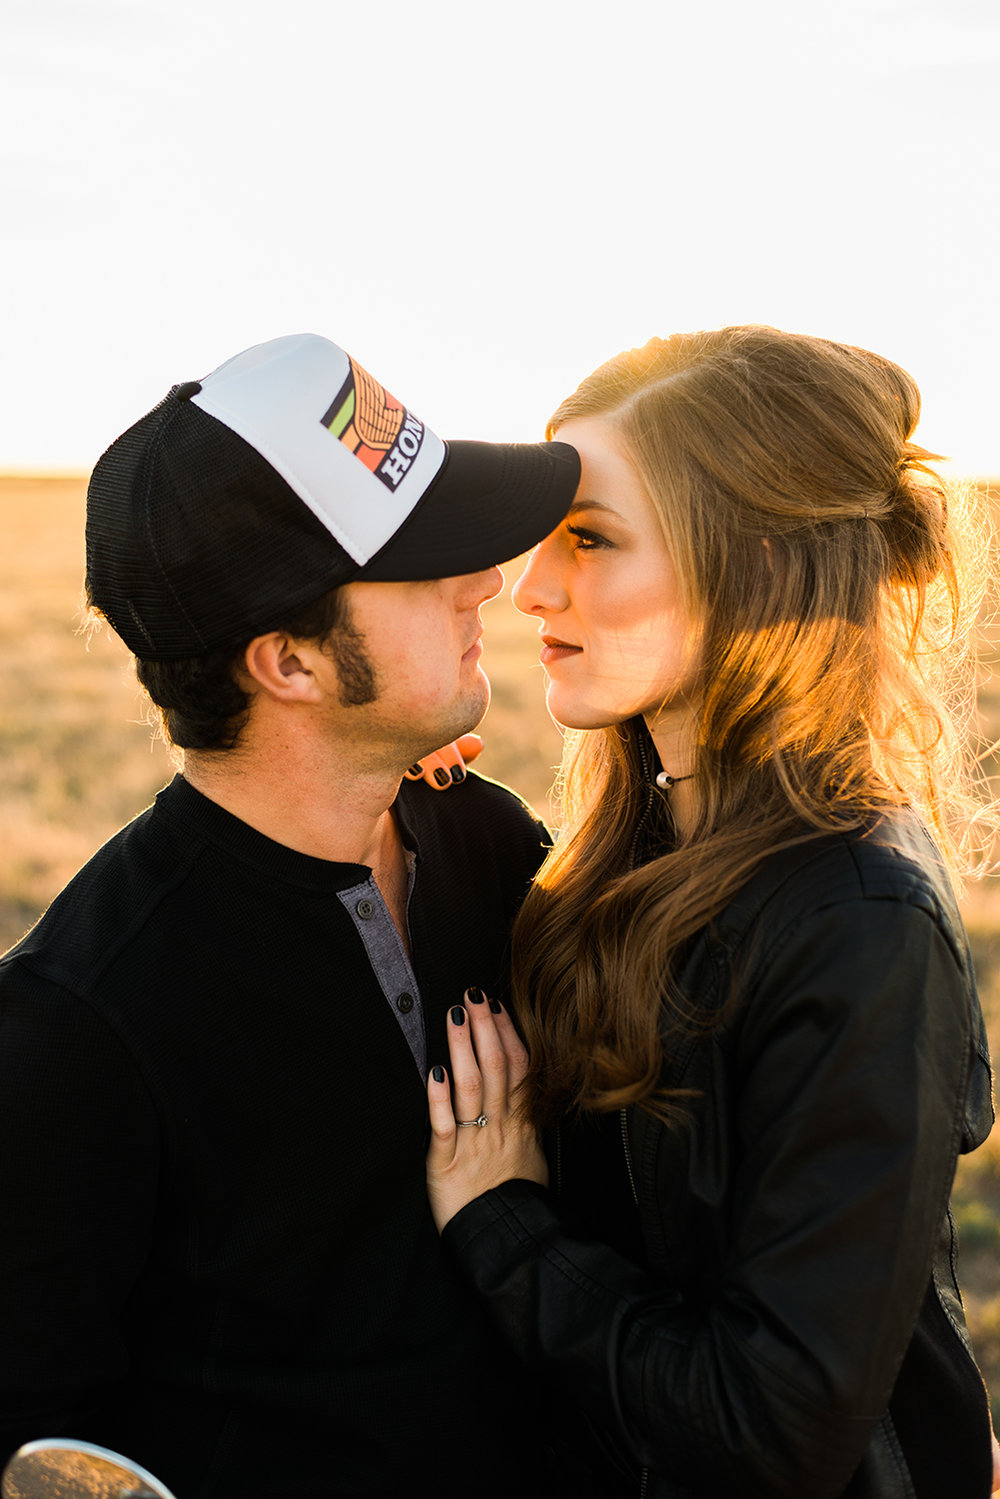 edgy-motorcycle-couple-shoot-denver-photographer-23.jpg